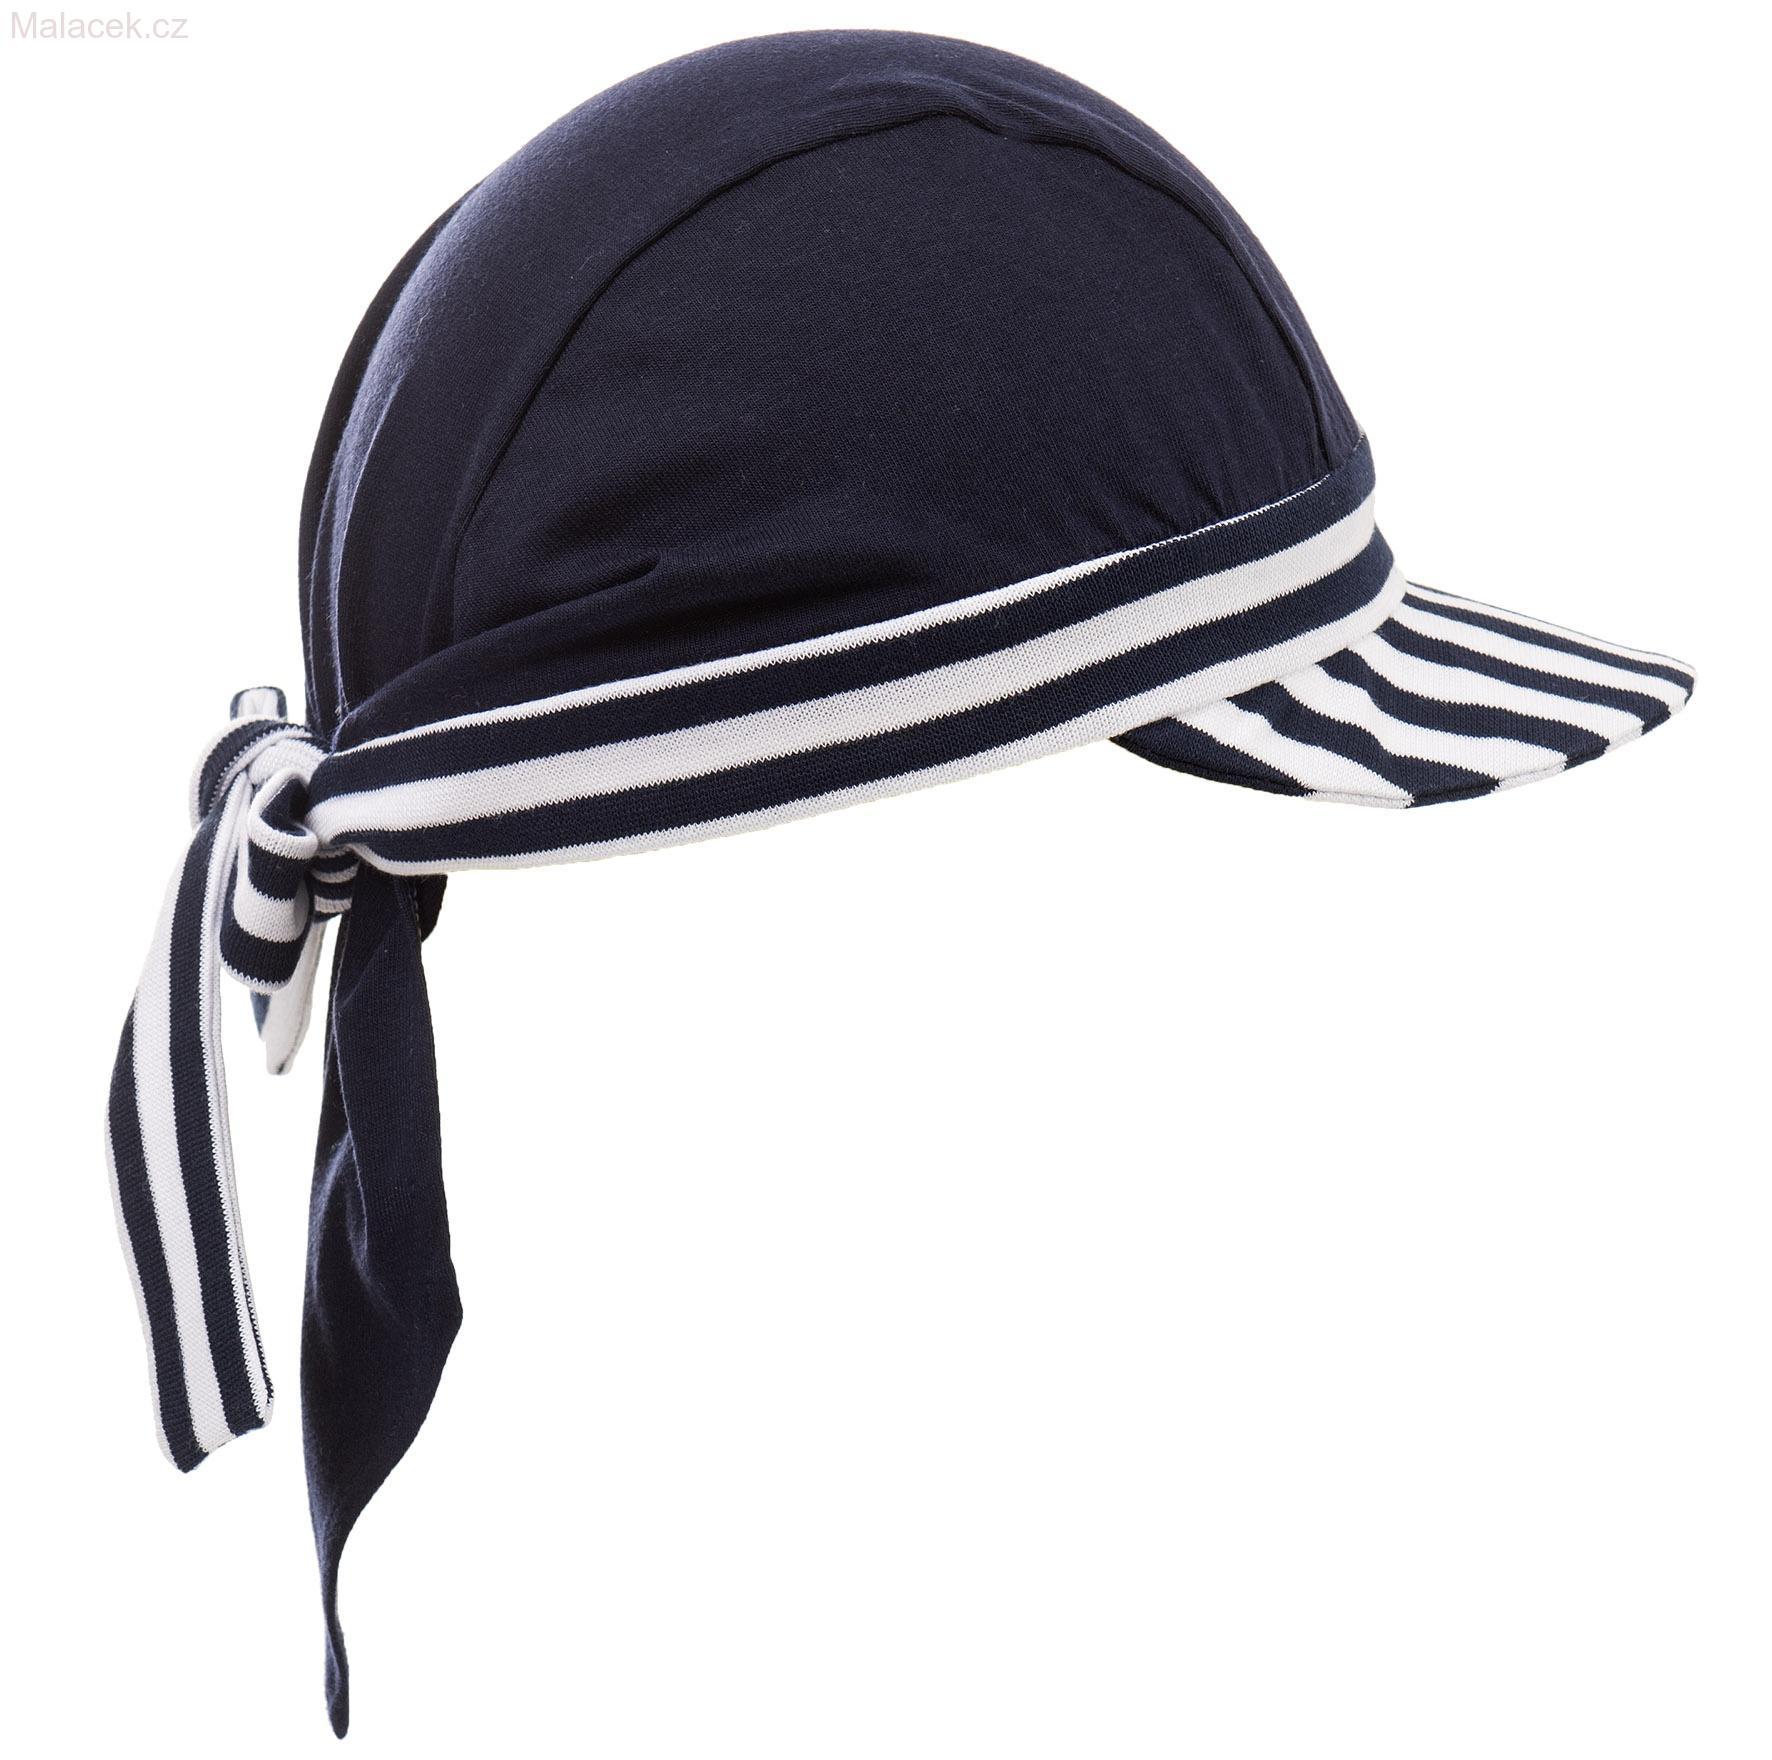 5cbe5c9868a Pirátský šátek s kšiltem námořnický